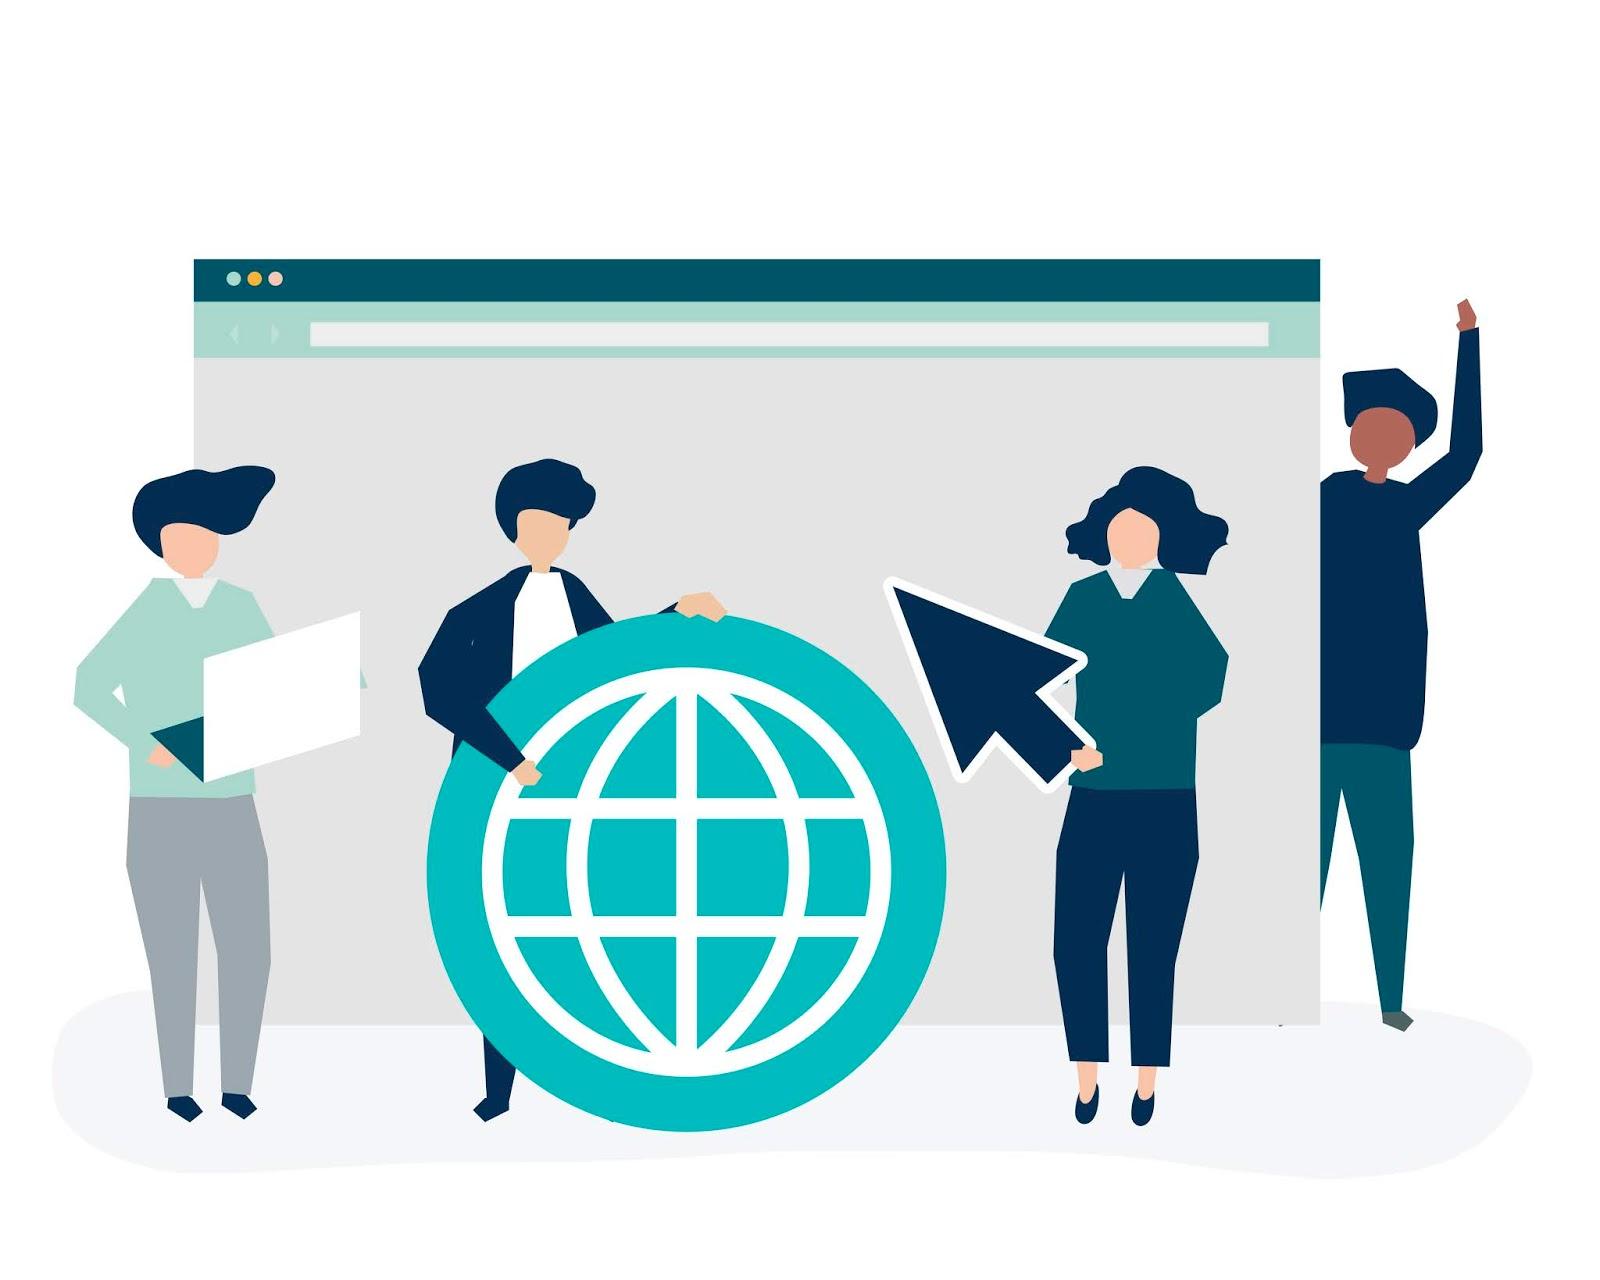 WEB Hosting Tips 2020: 3 Major Selecting Tips A Web Host 2020